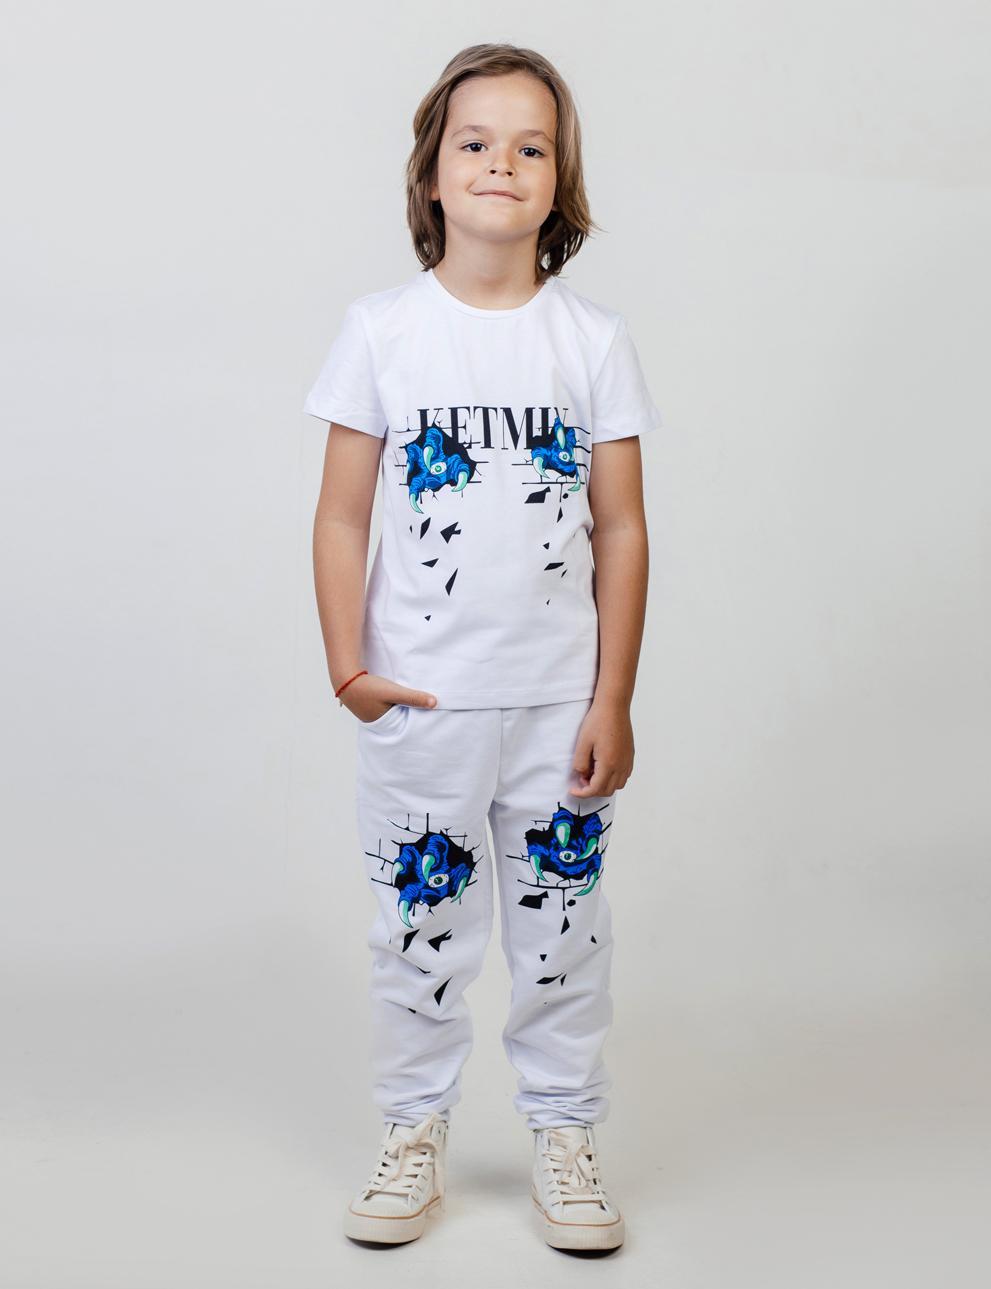 Костюм для мальчика KETMIN Когти цв.Белый